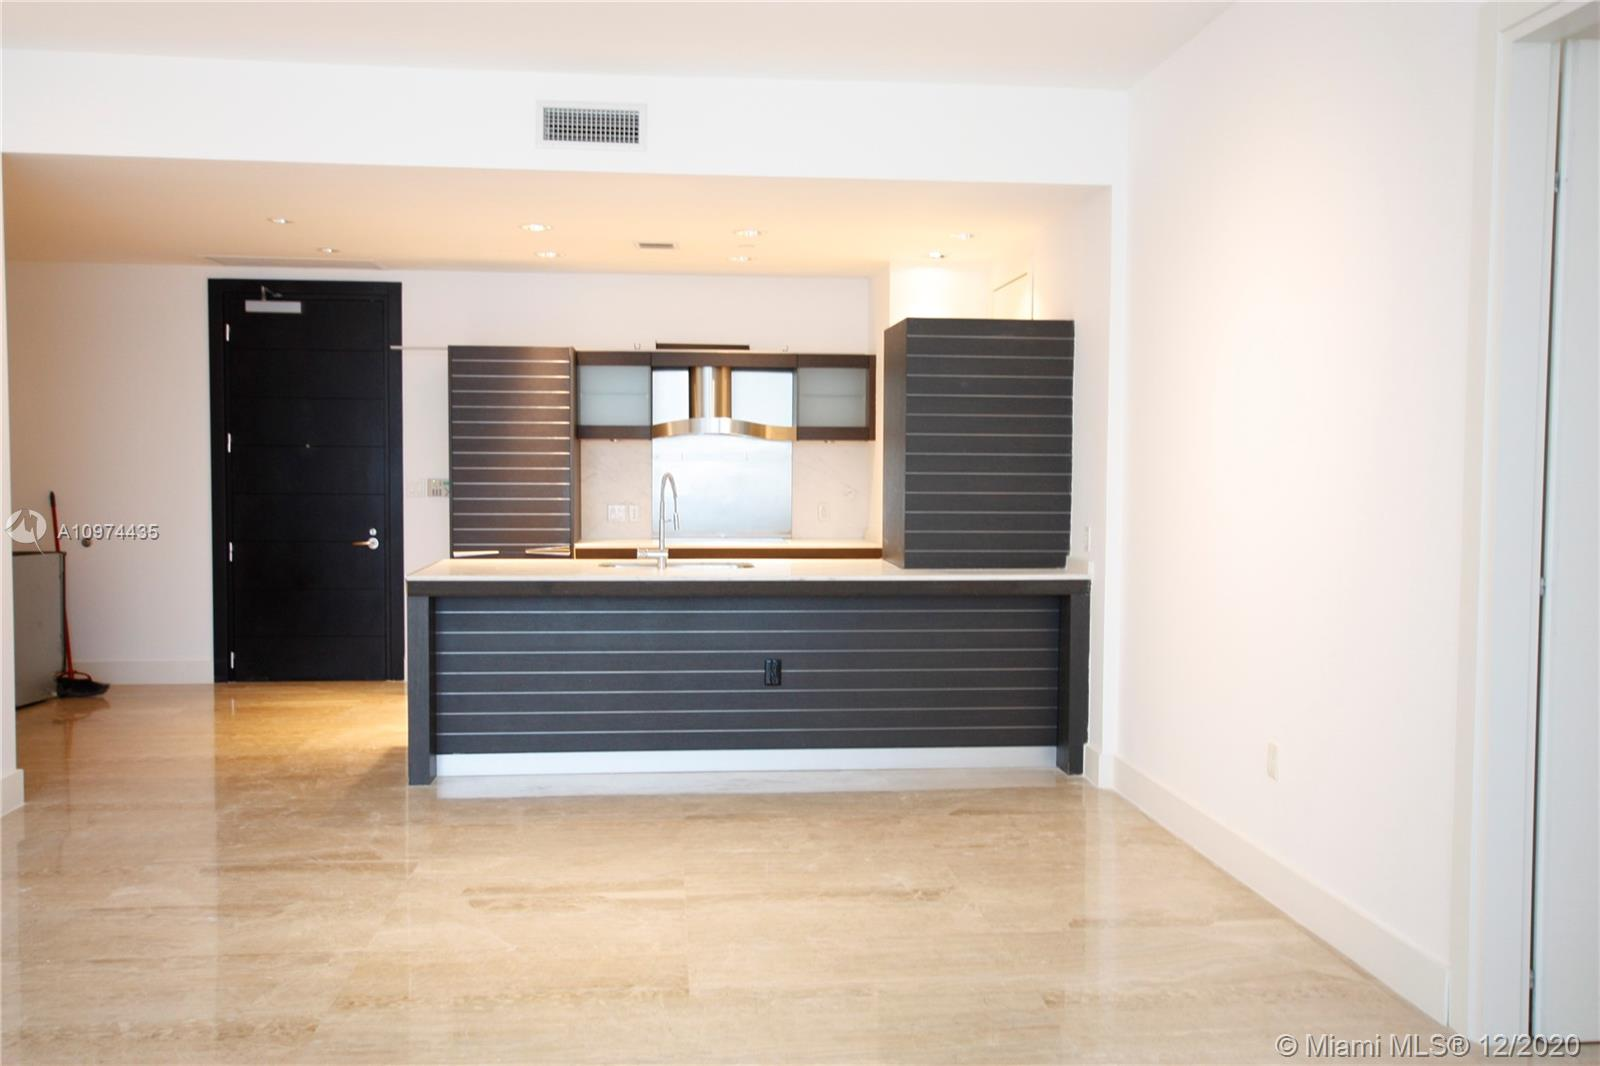 Epic Residences #4610 - 200 Biscayne Boulevard Way #4610, Miami, FL 33131